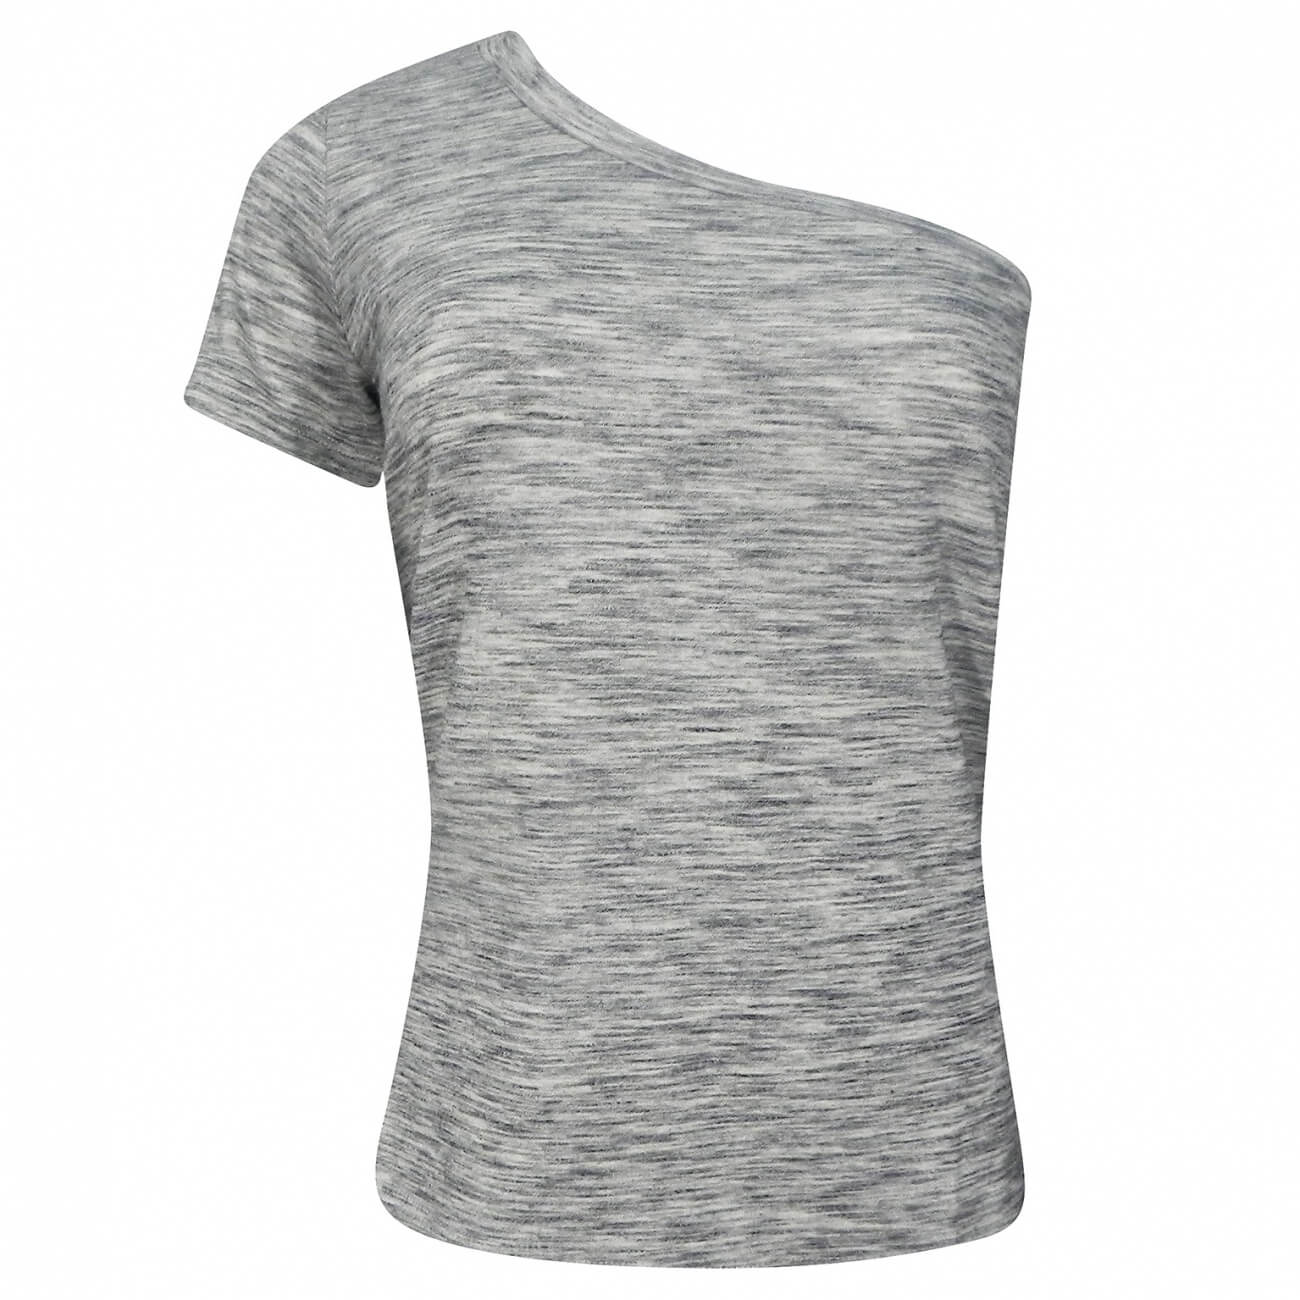 6a413013f Cheroy Roupas Comprar Online | Vestidos, Blusas e Saias - Pole Modas